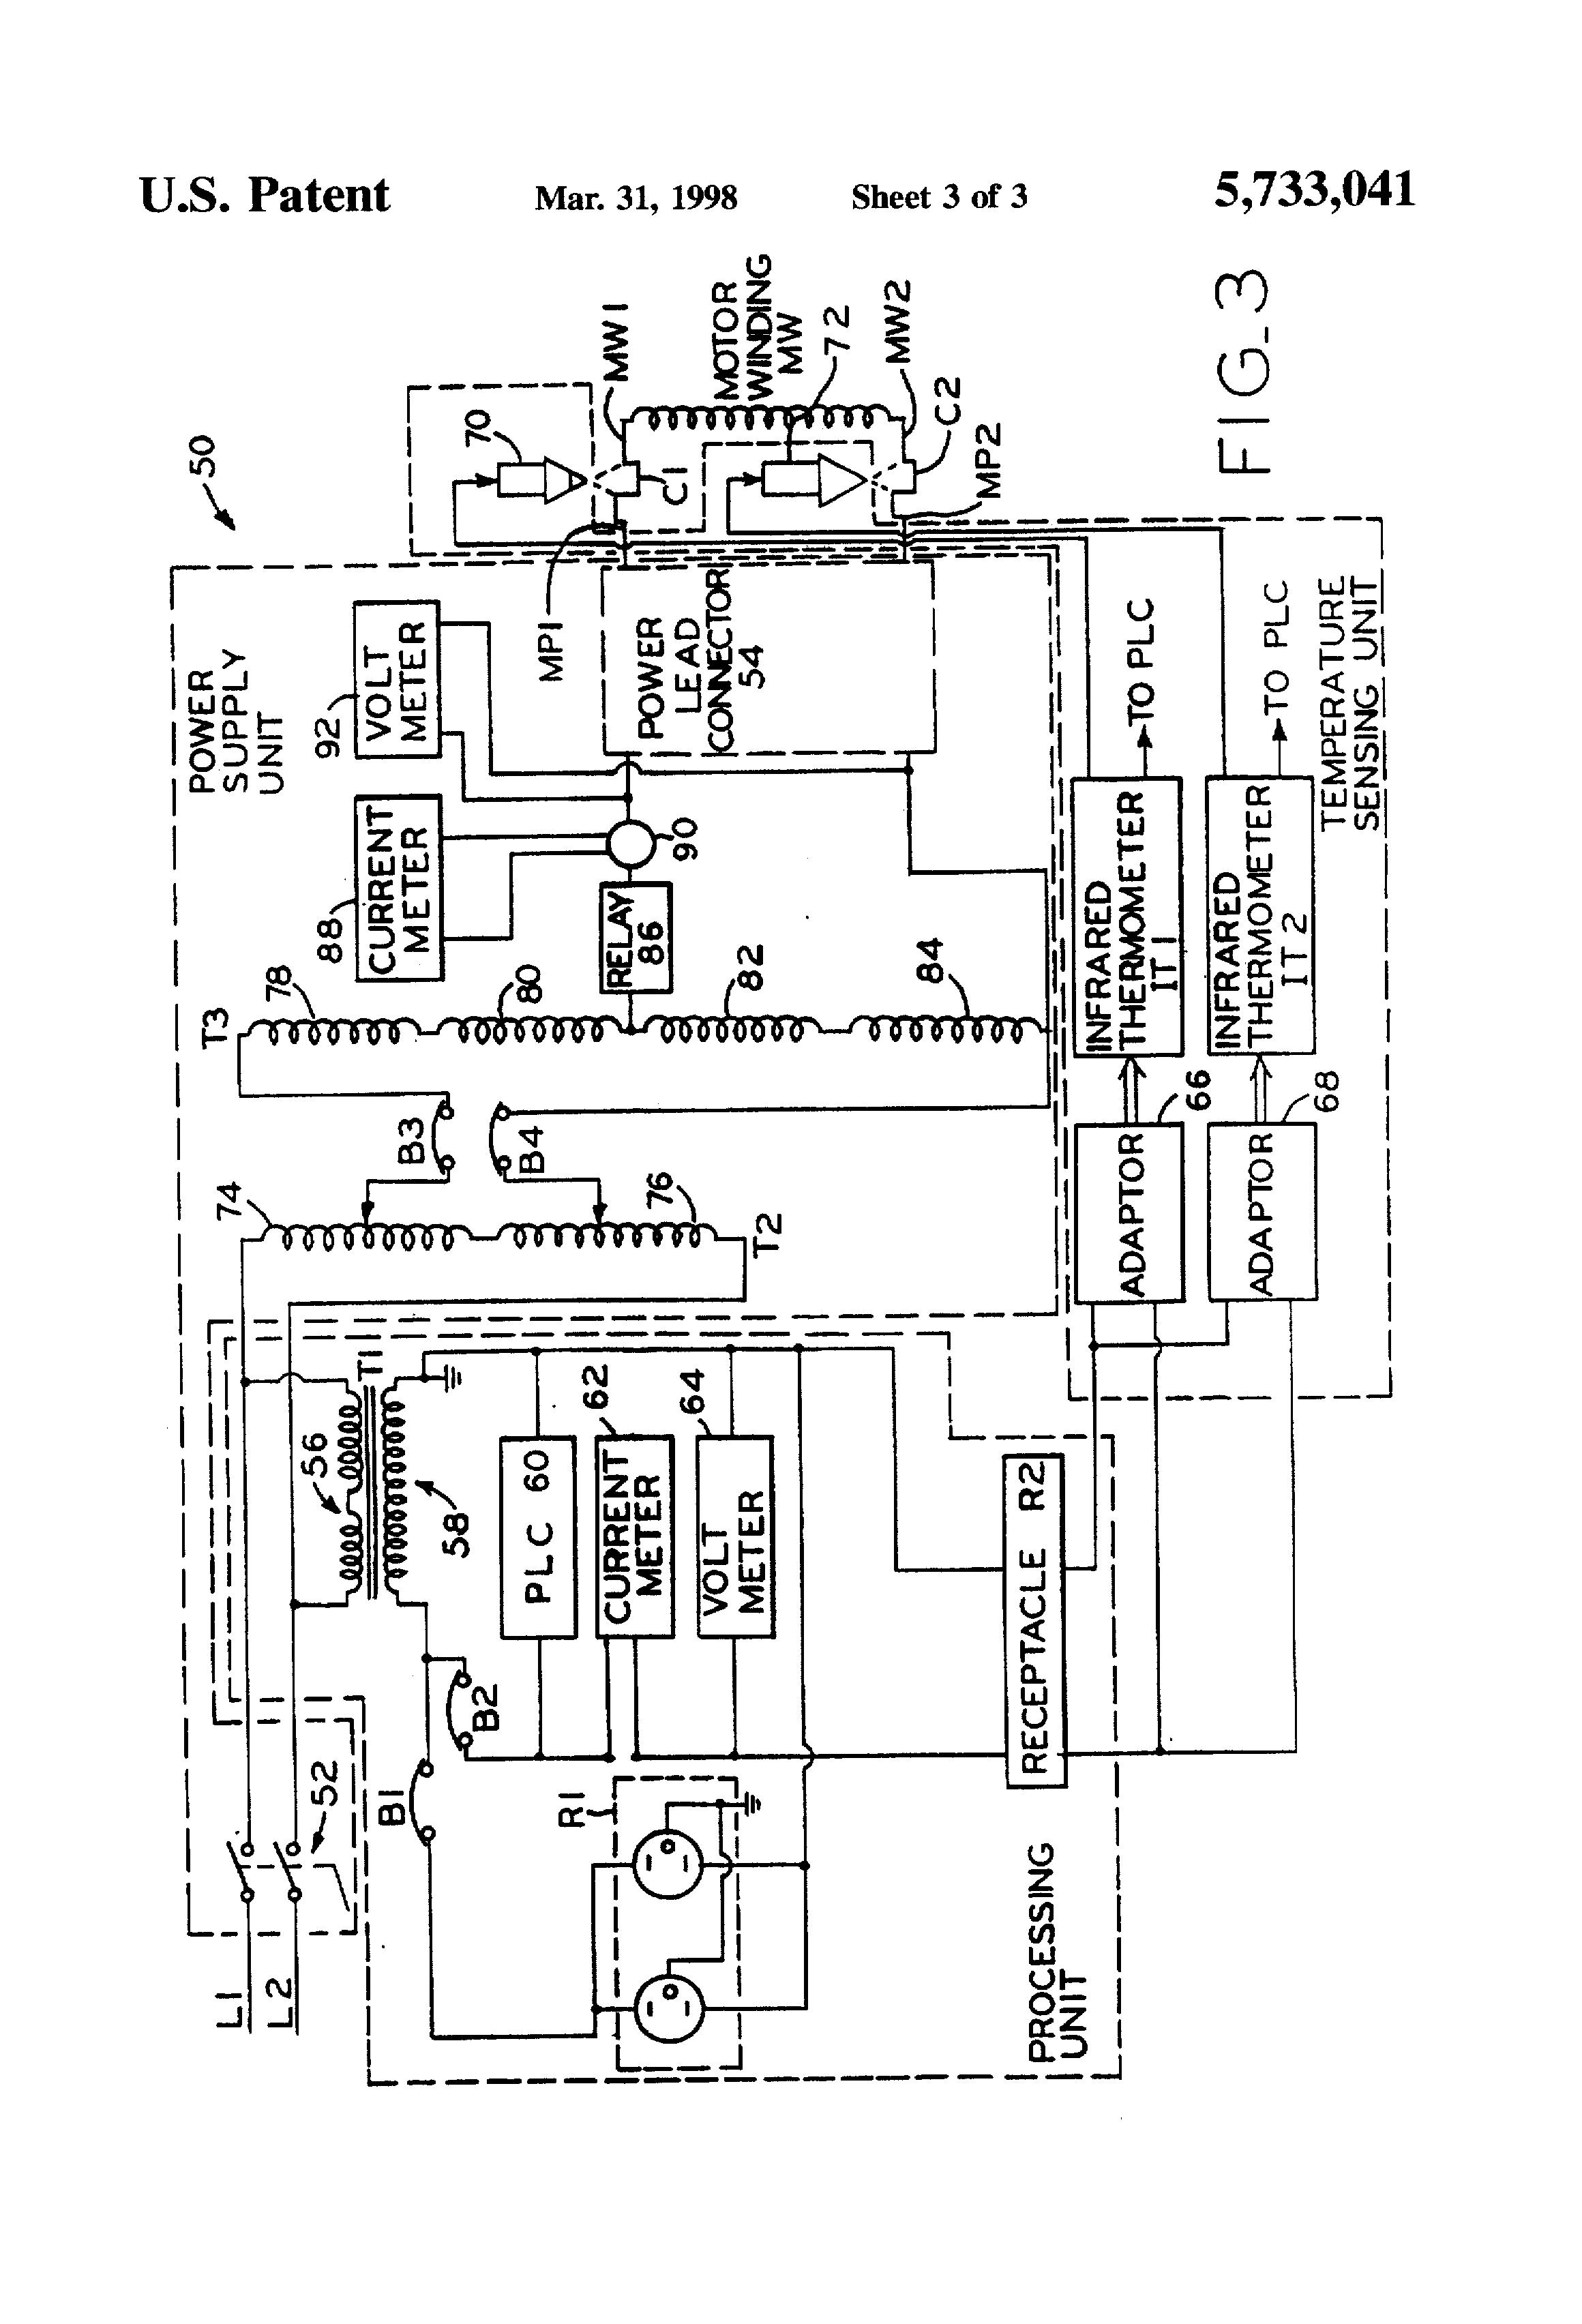 Rs51 Voltage Regulator Wiring Diagram